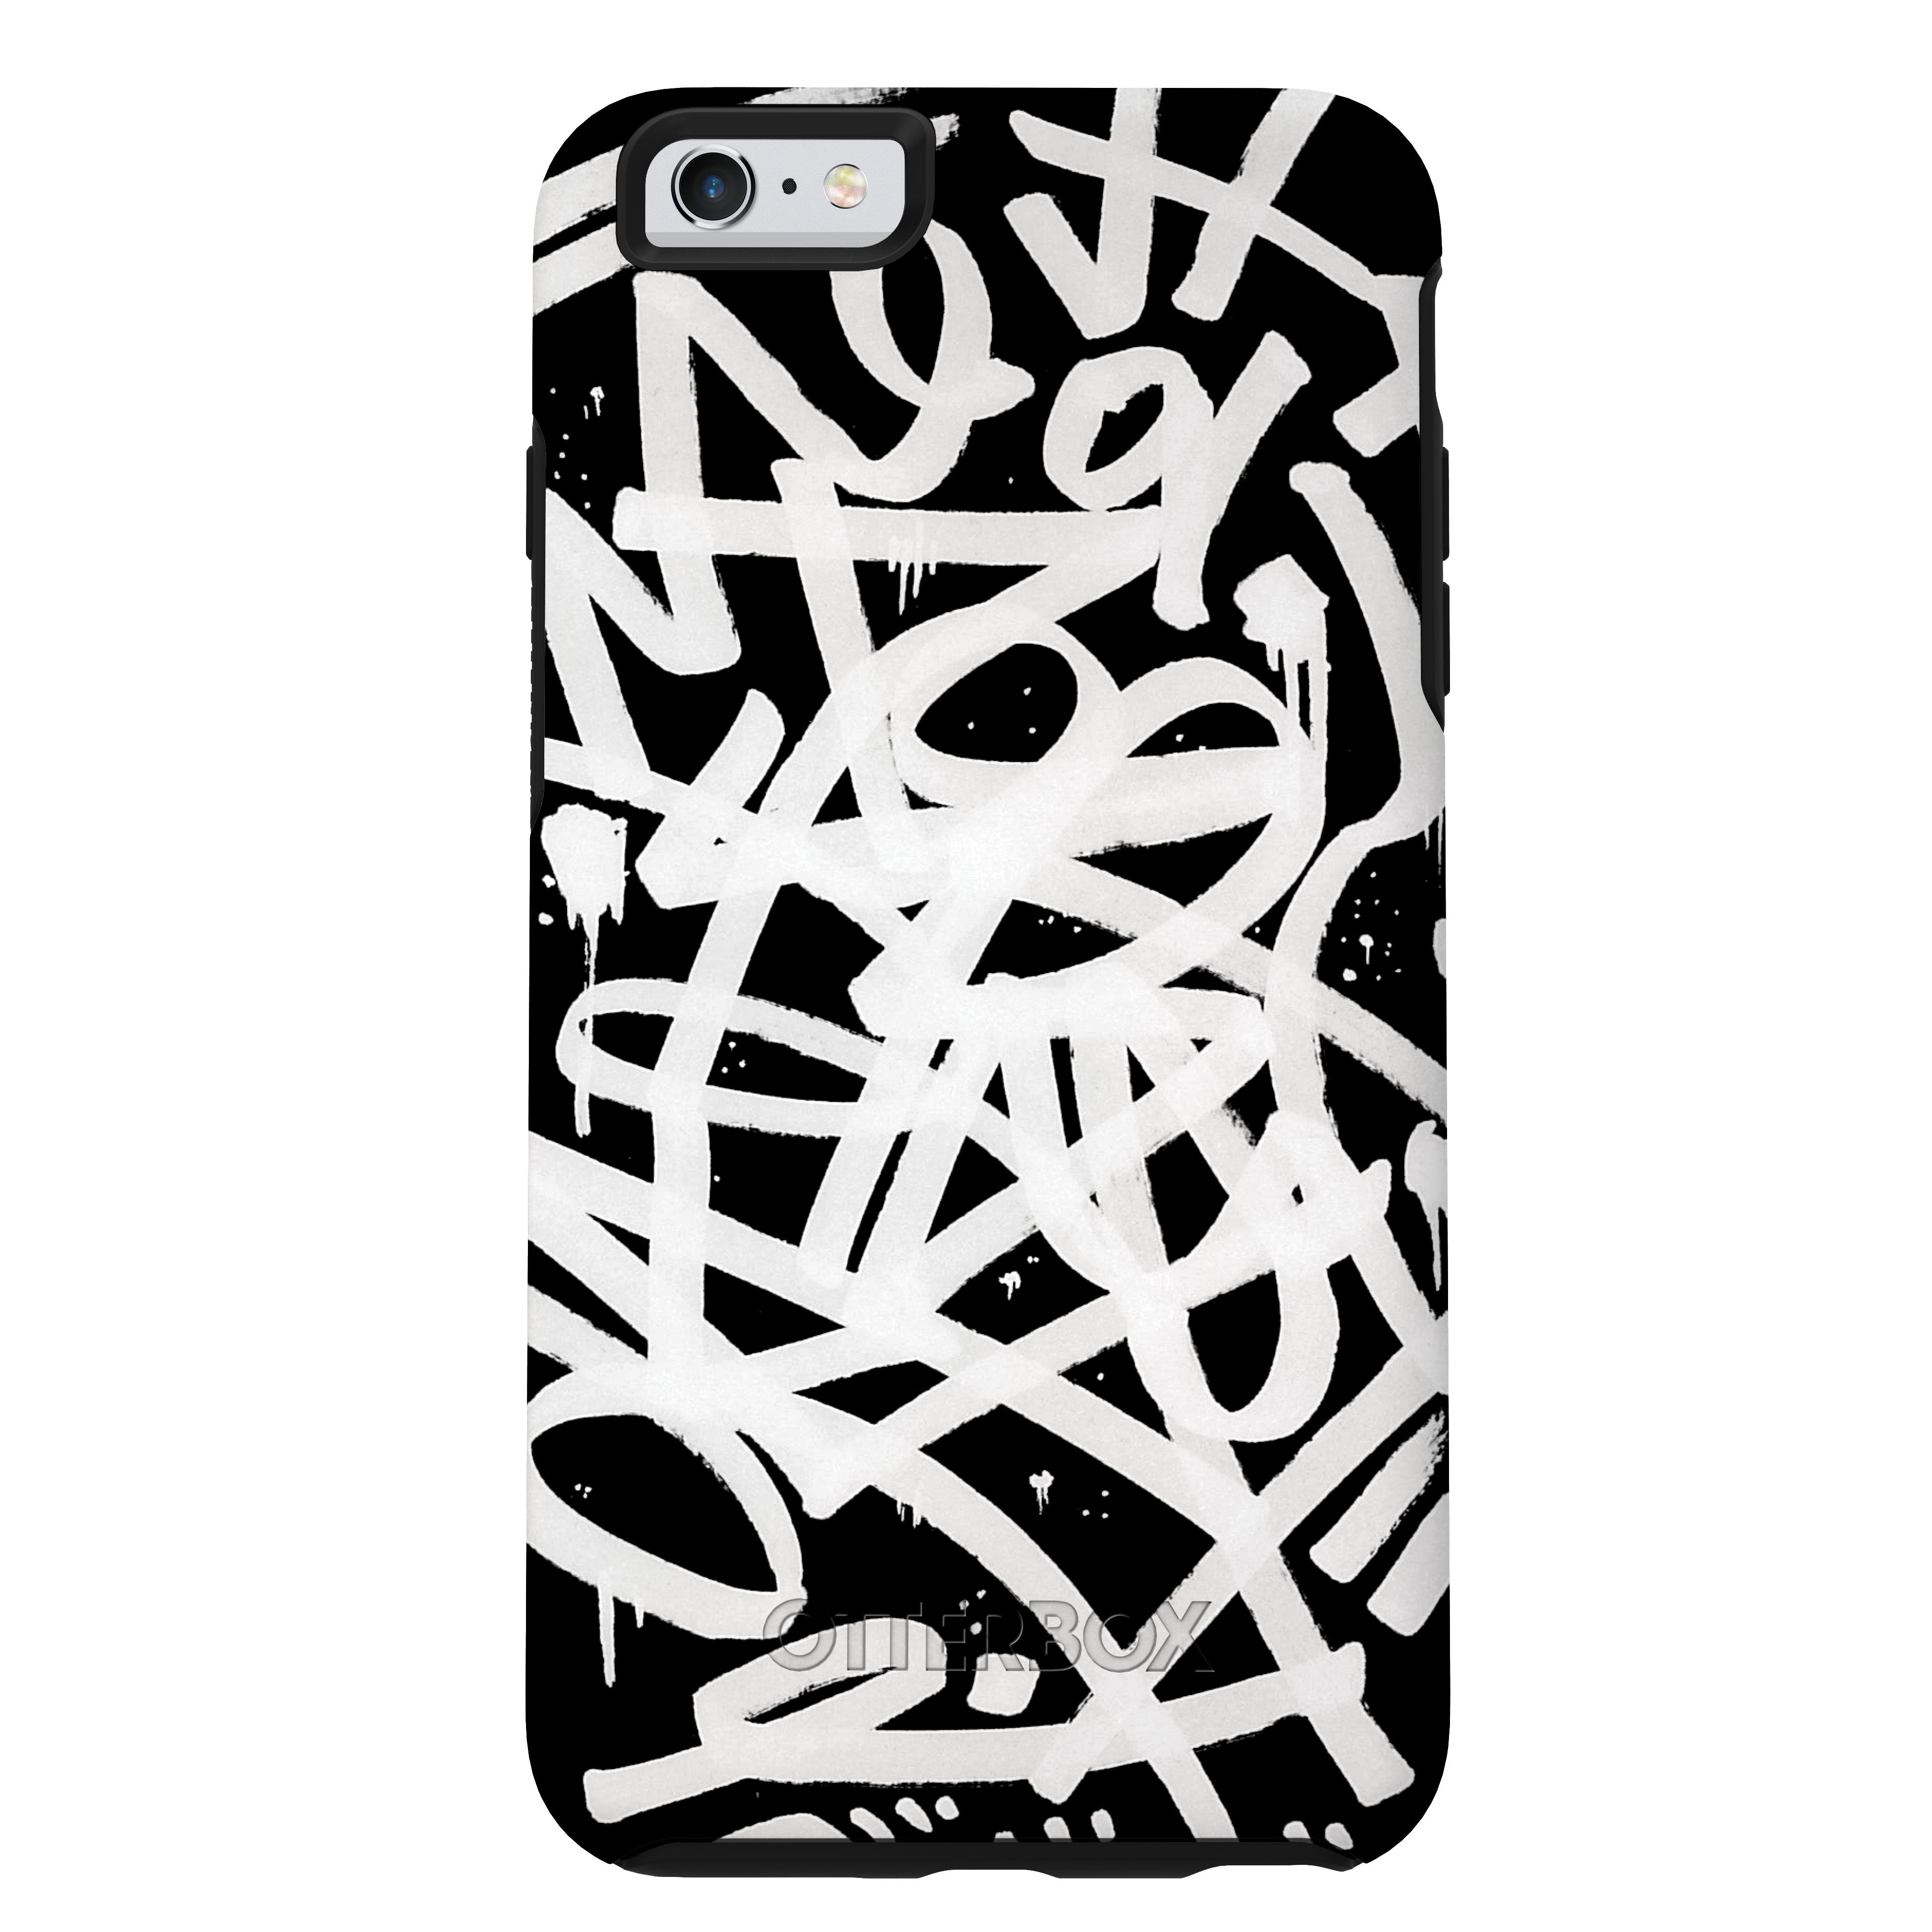 OtterBox iPhone 6s plus case - Symmetry Slim Case